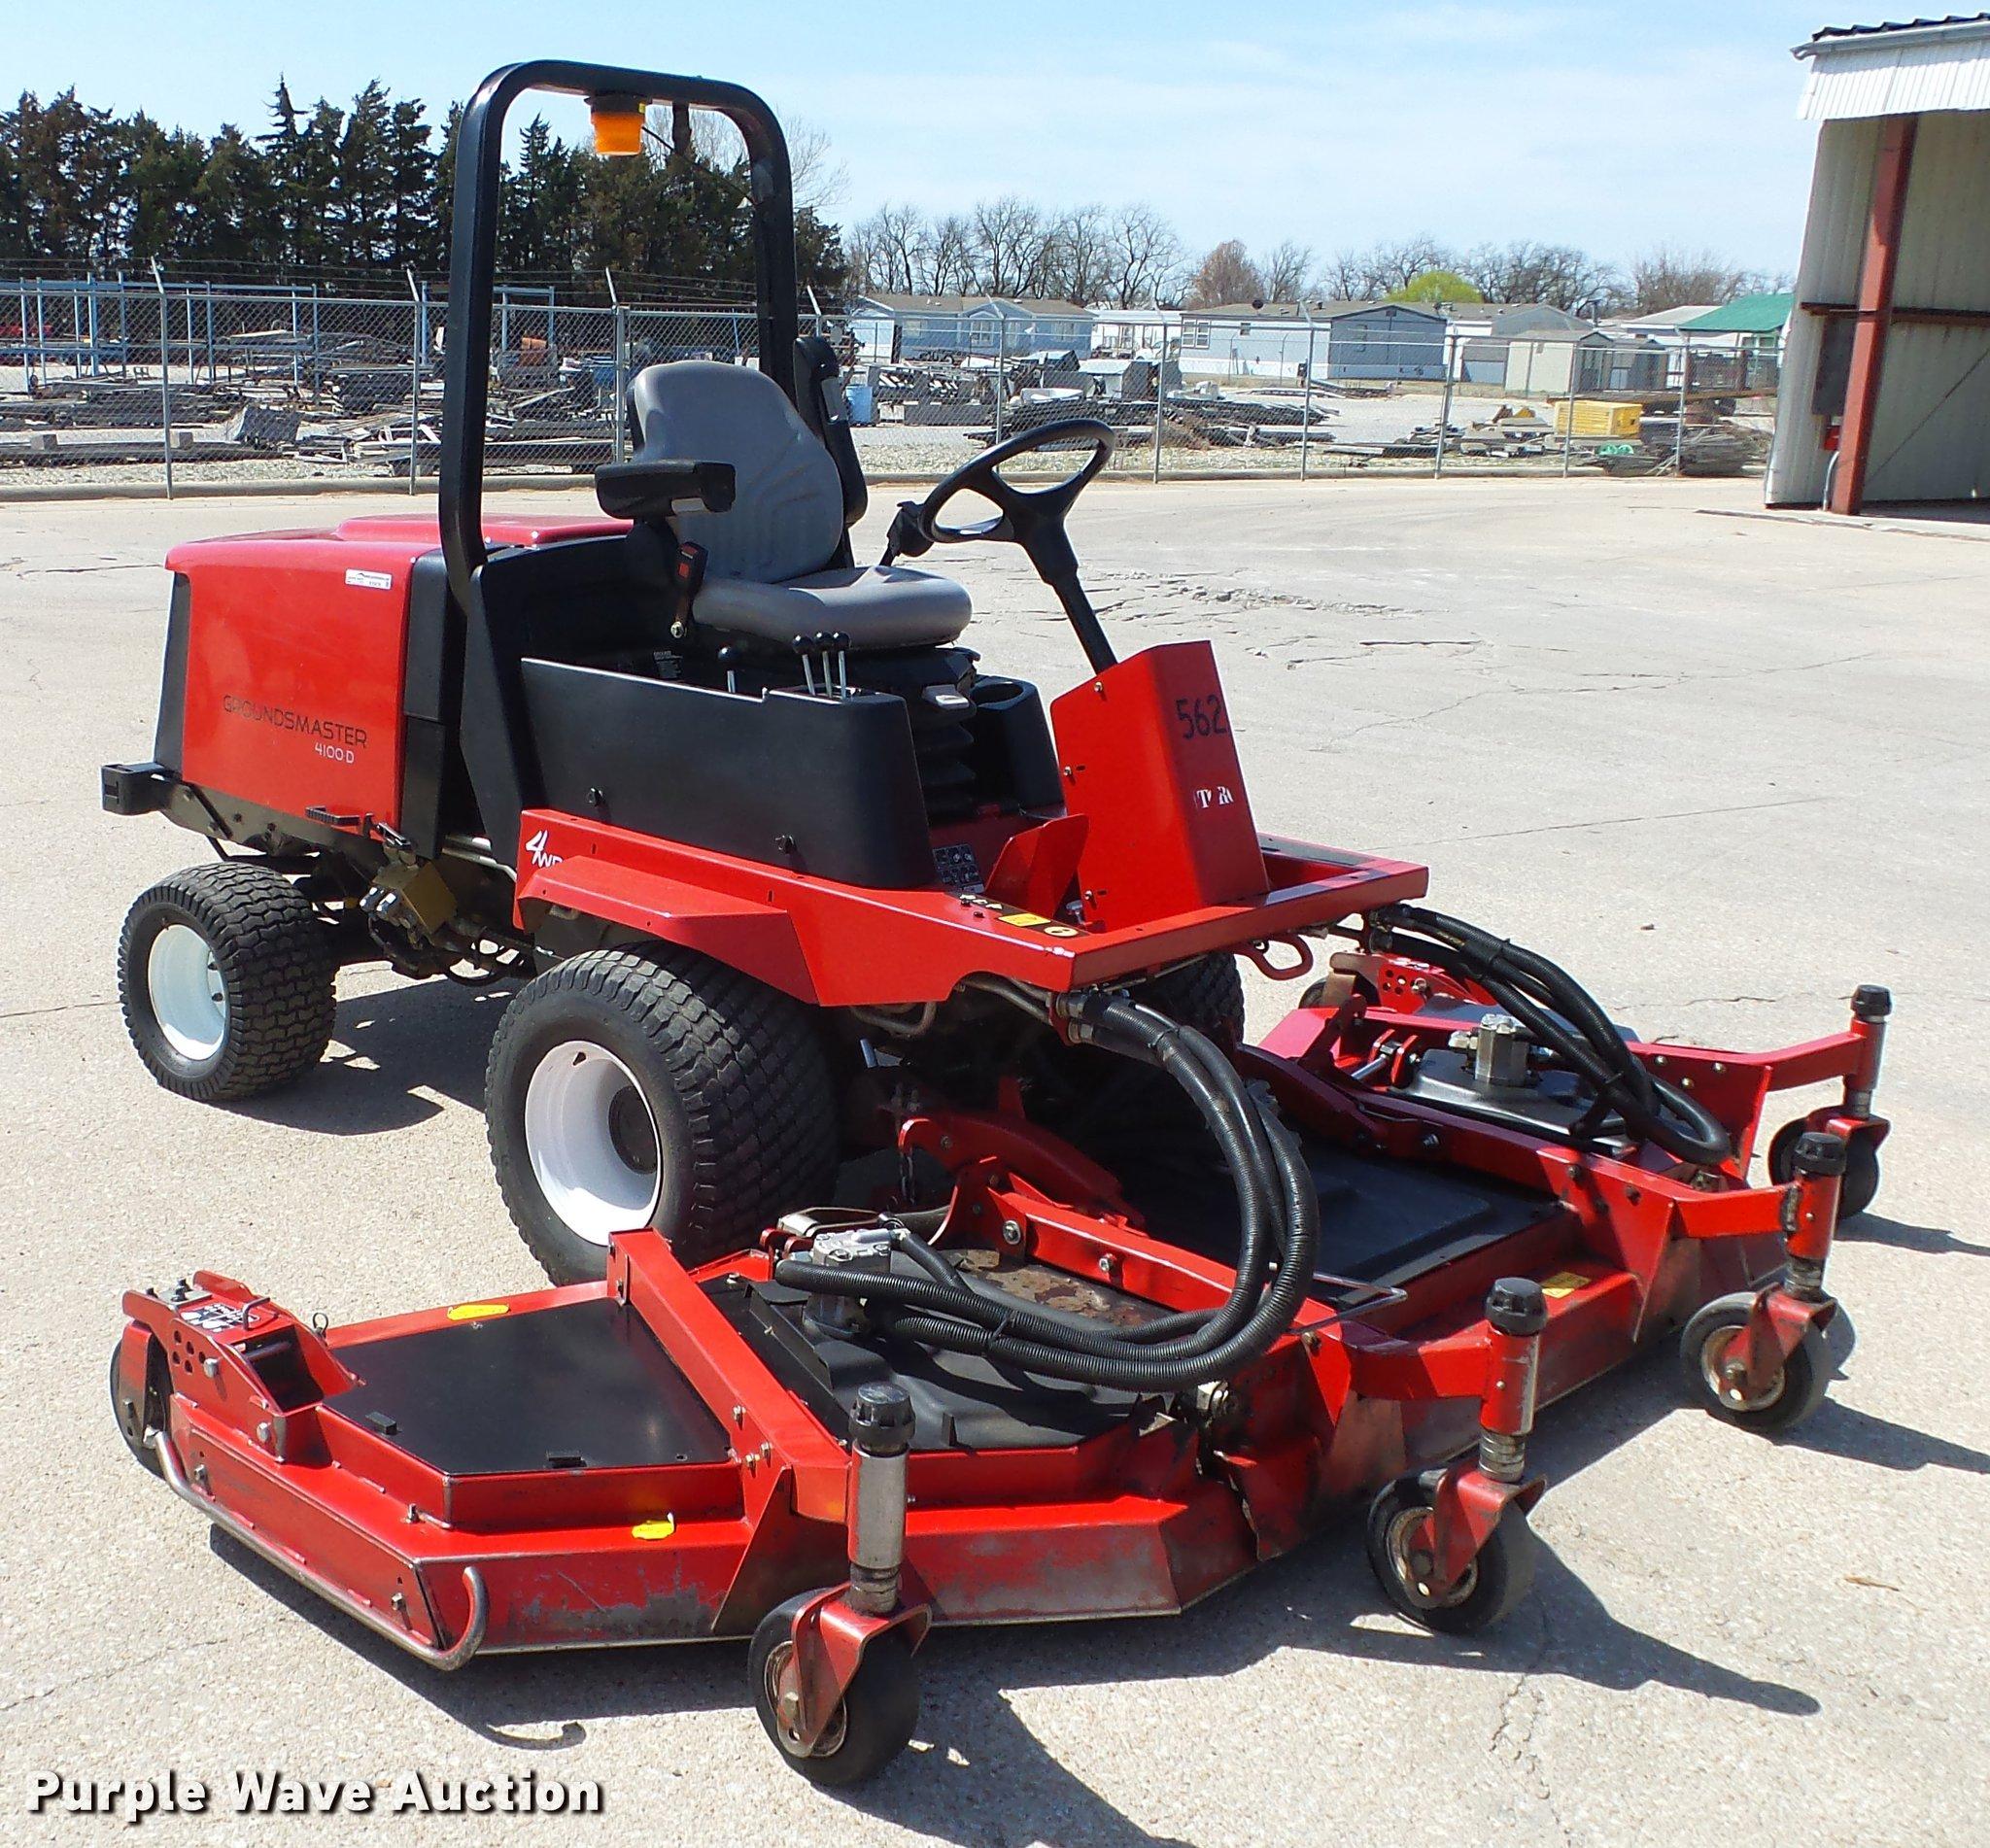 Toro Groundsmaster 4100 Ztr Lawn Mower Item Ex9036 5 1